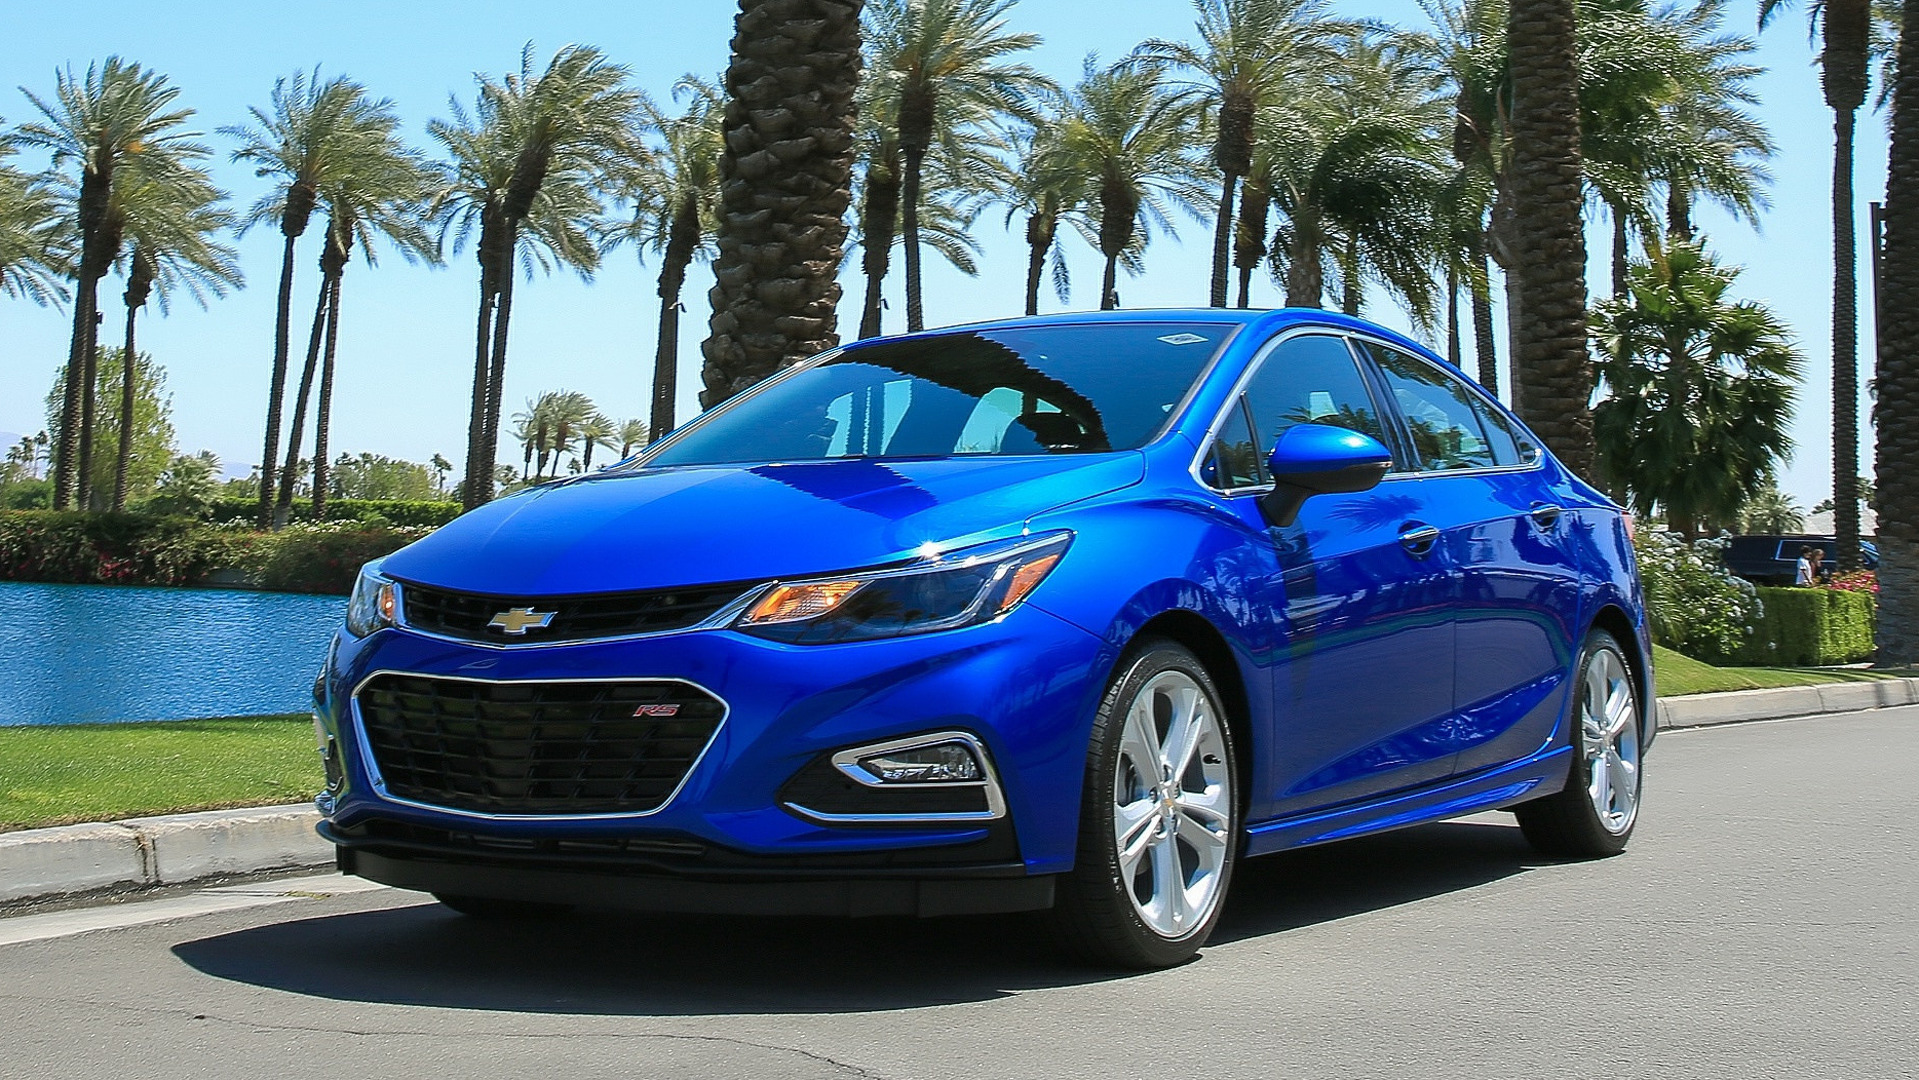 Kelebihan Kekurangan Chevrolet Cruze Rs Tangguh